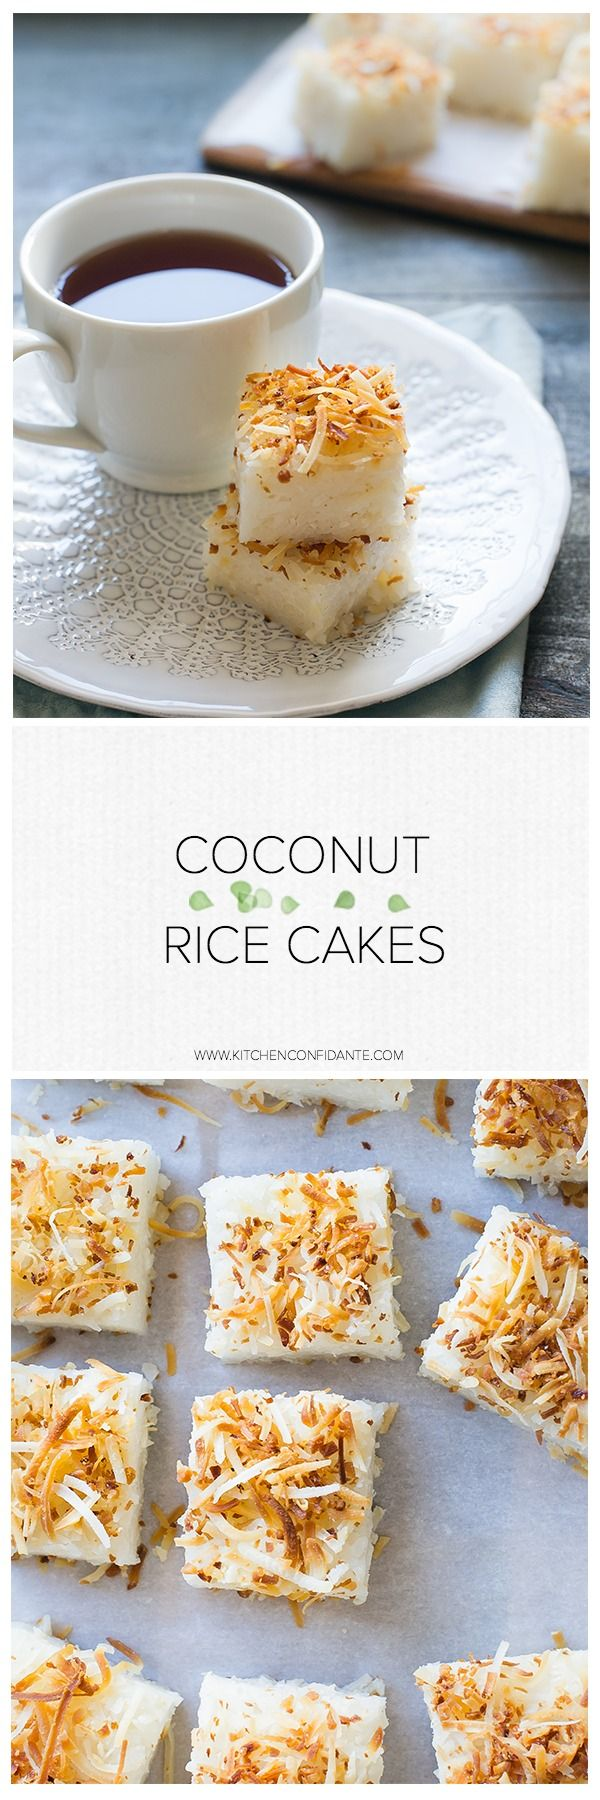 Coconut Rice Cakes   Rice cakes, Dessert recipes, Sushi rice